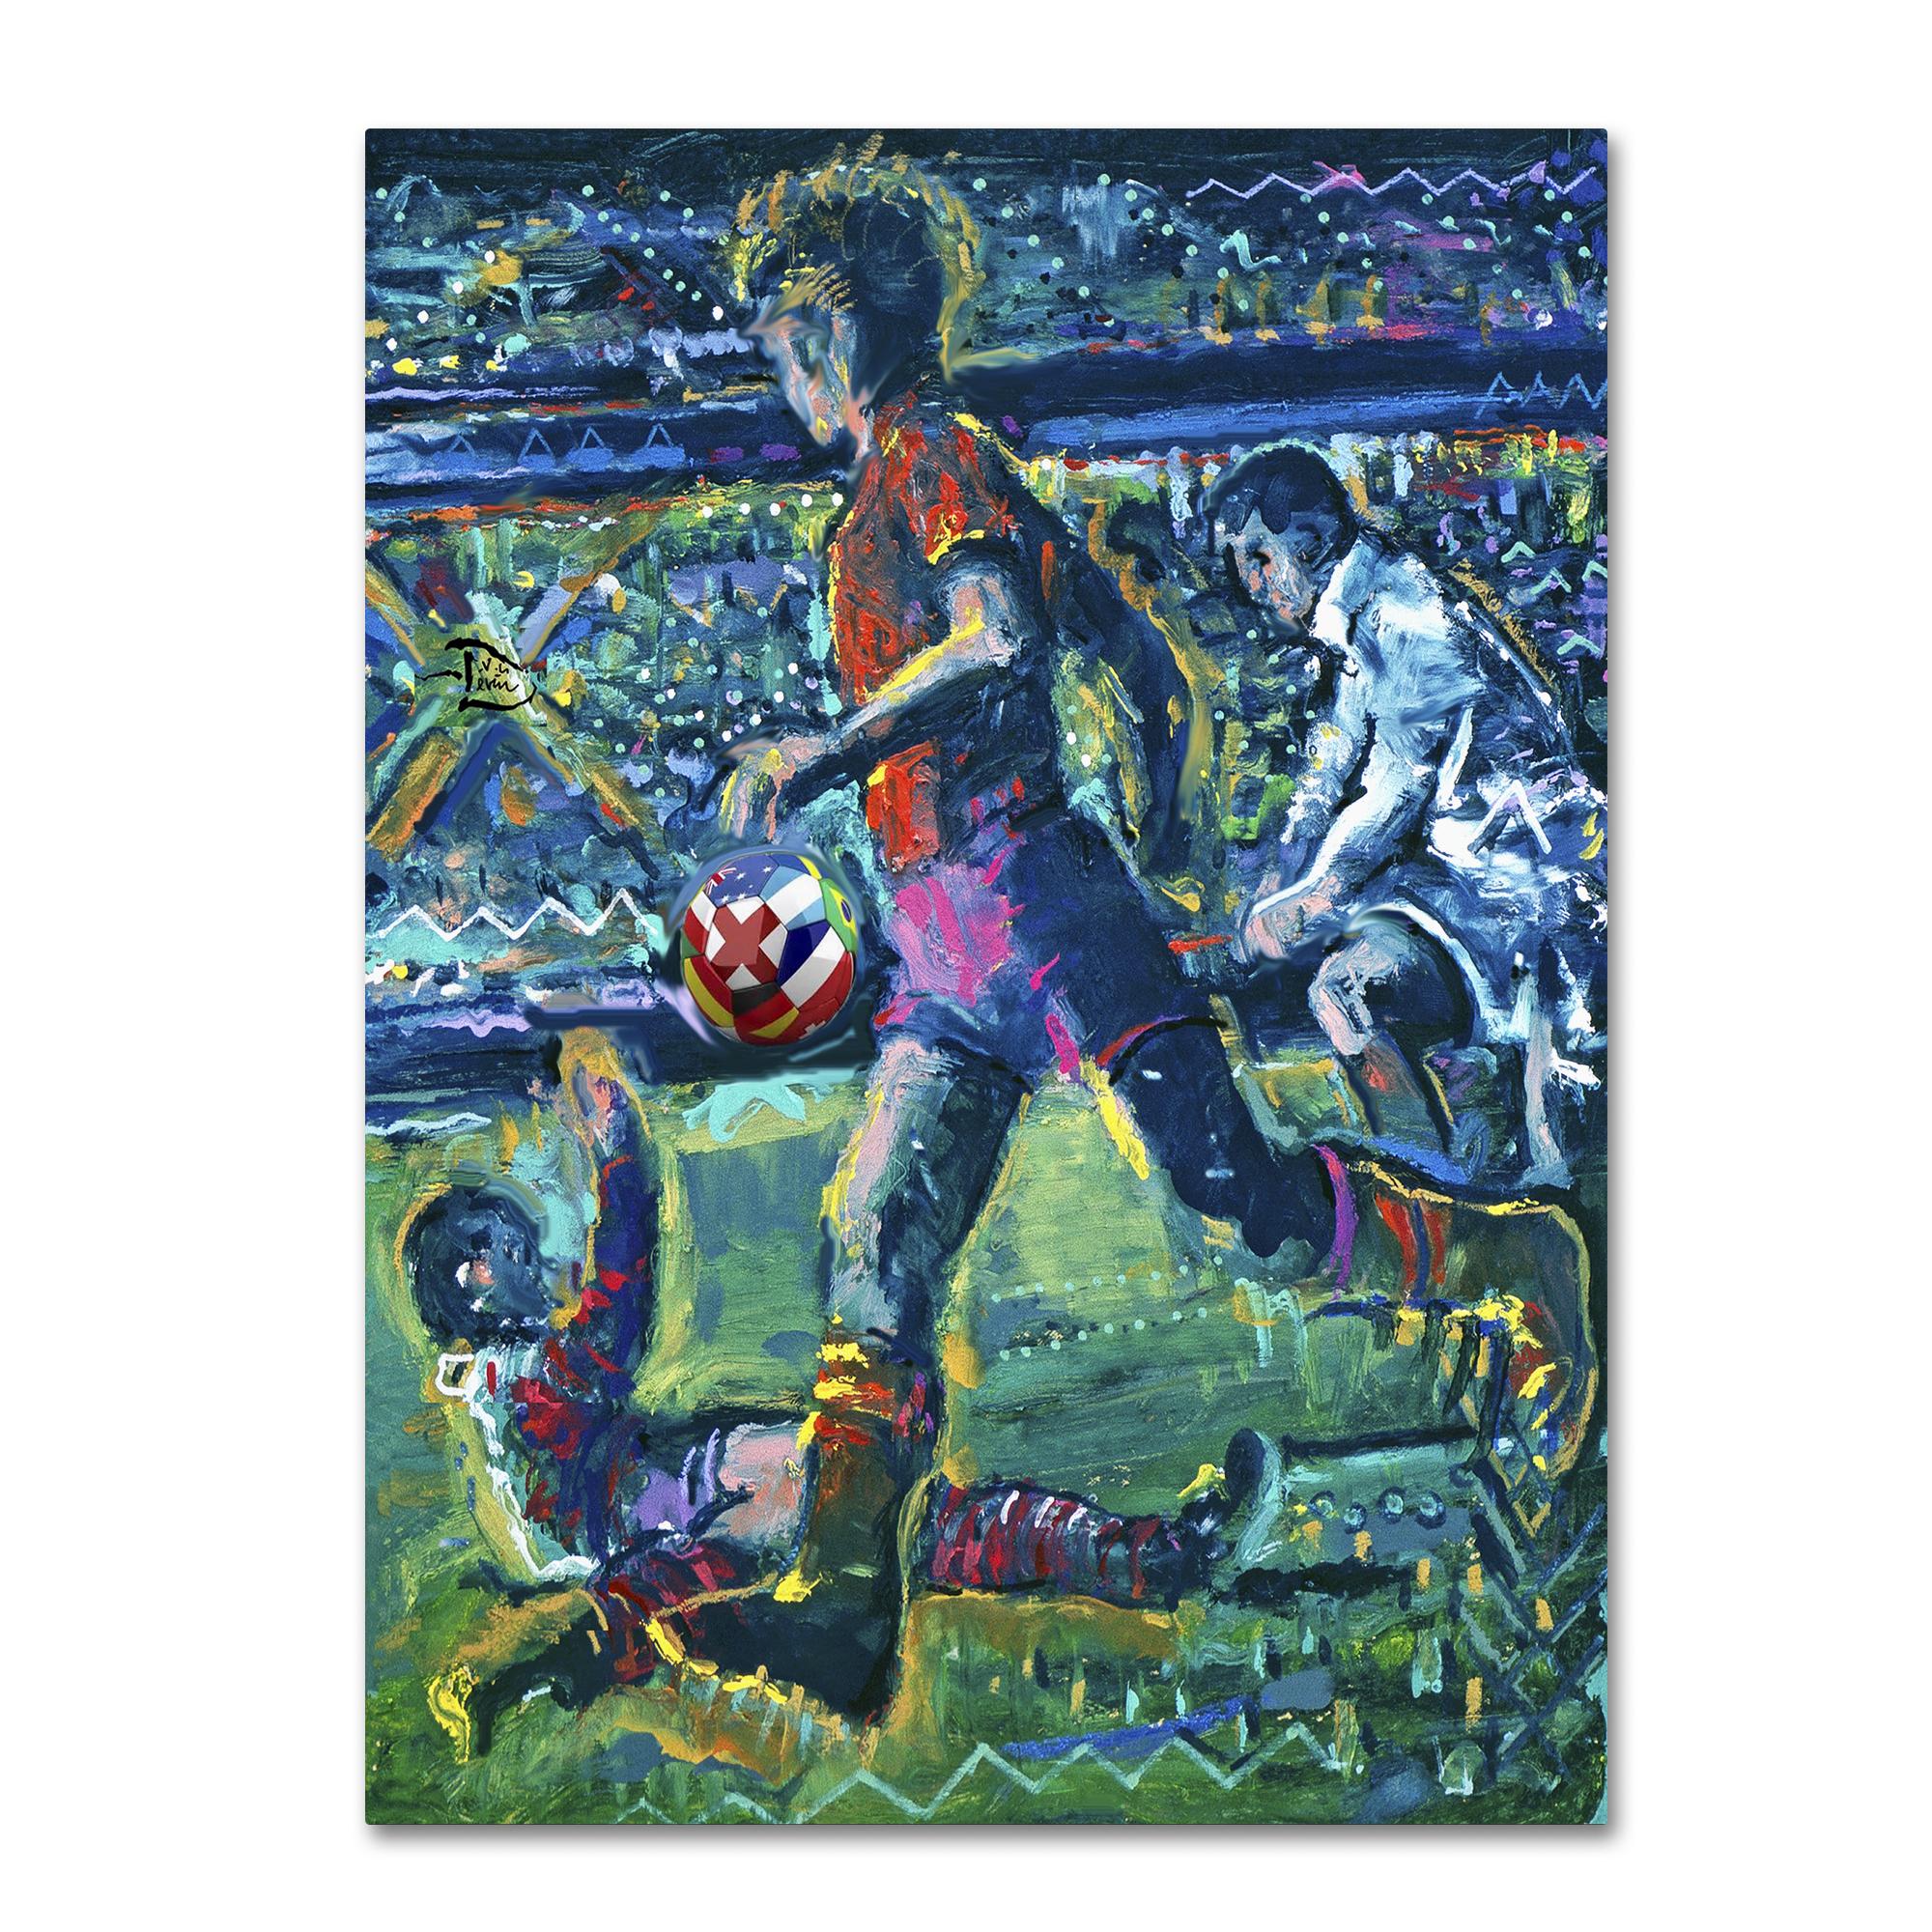 Trademark Fine Art Lowell S.V. Devin 'World Cup Dream' Canvas Art PartNumber: 021V002804855000P KsnValue: 2804855 MfgPartNumber: LSV0037-C3547GG